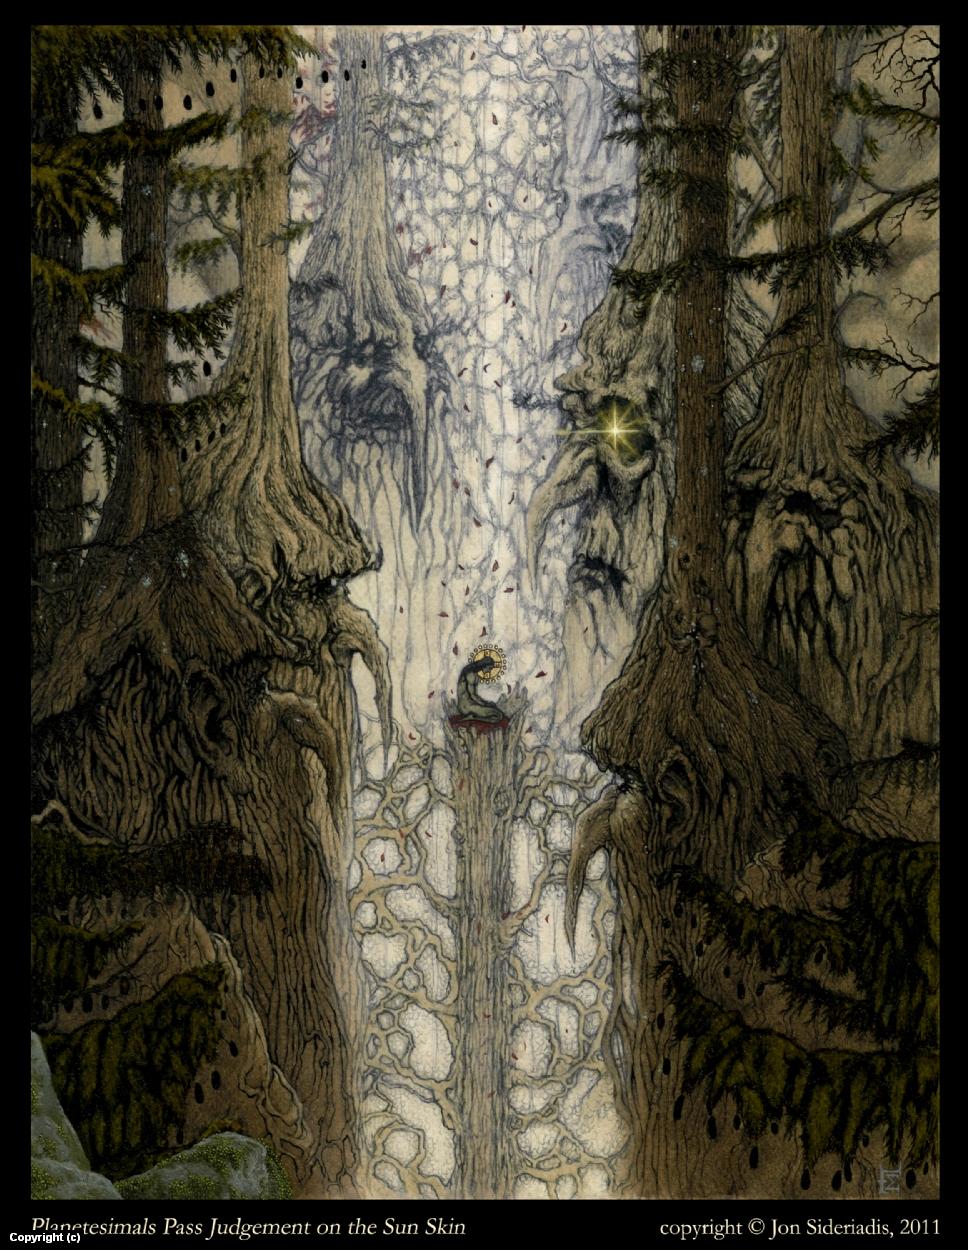 Planetesimals Artwork by Jon Sideriadis